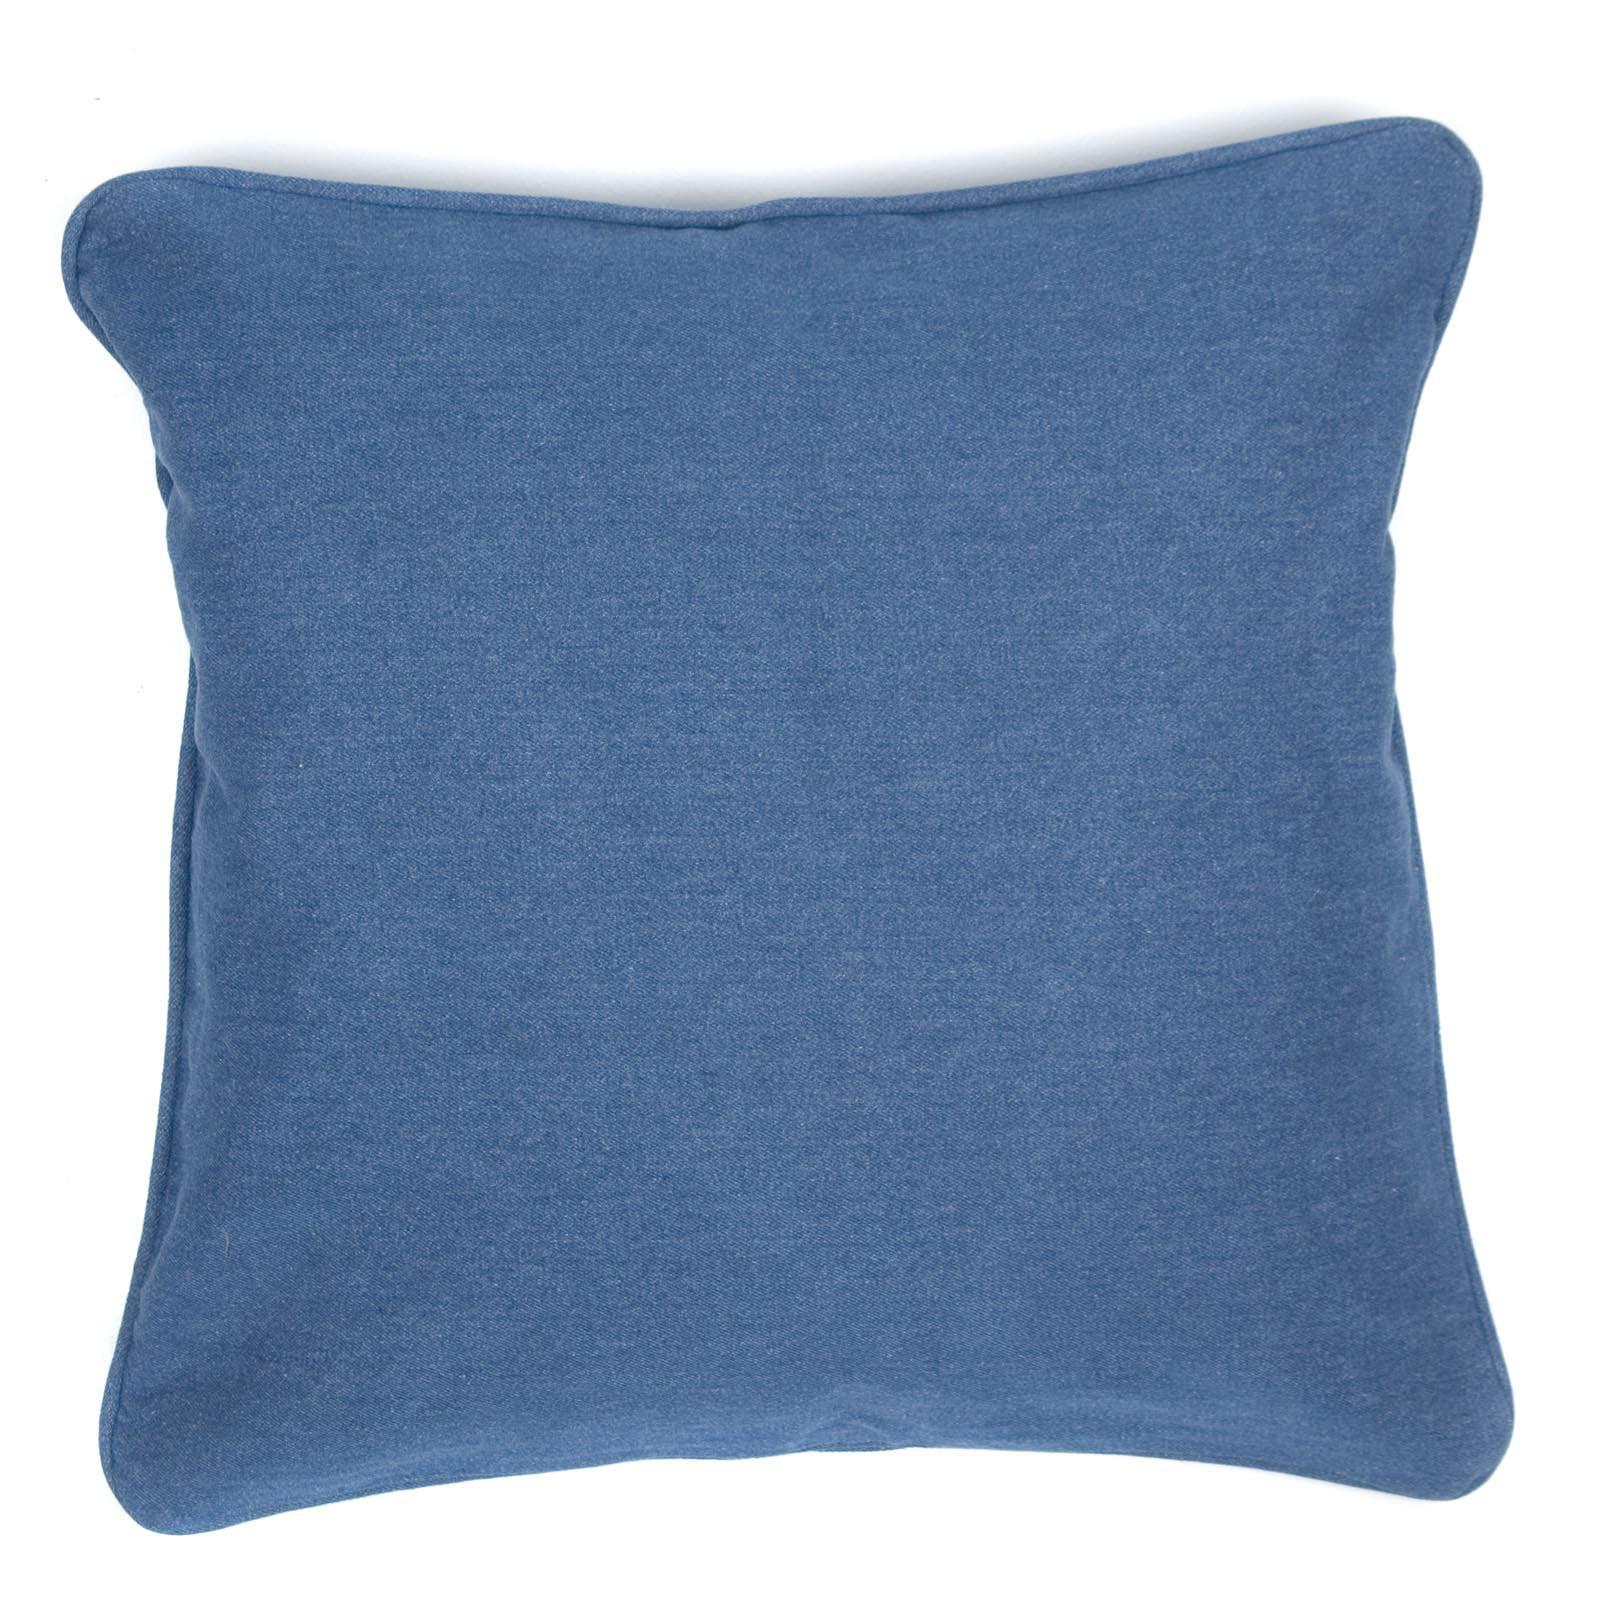 Denim Indigo Pillow